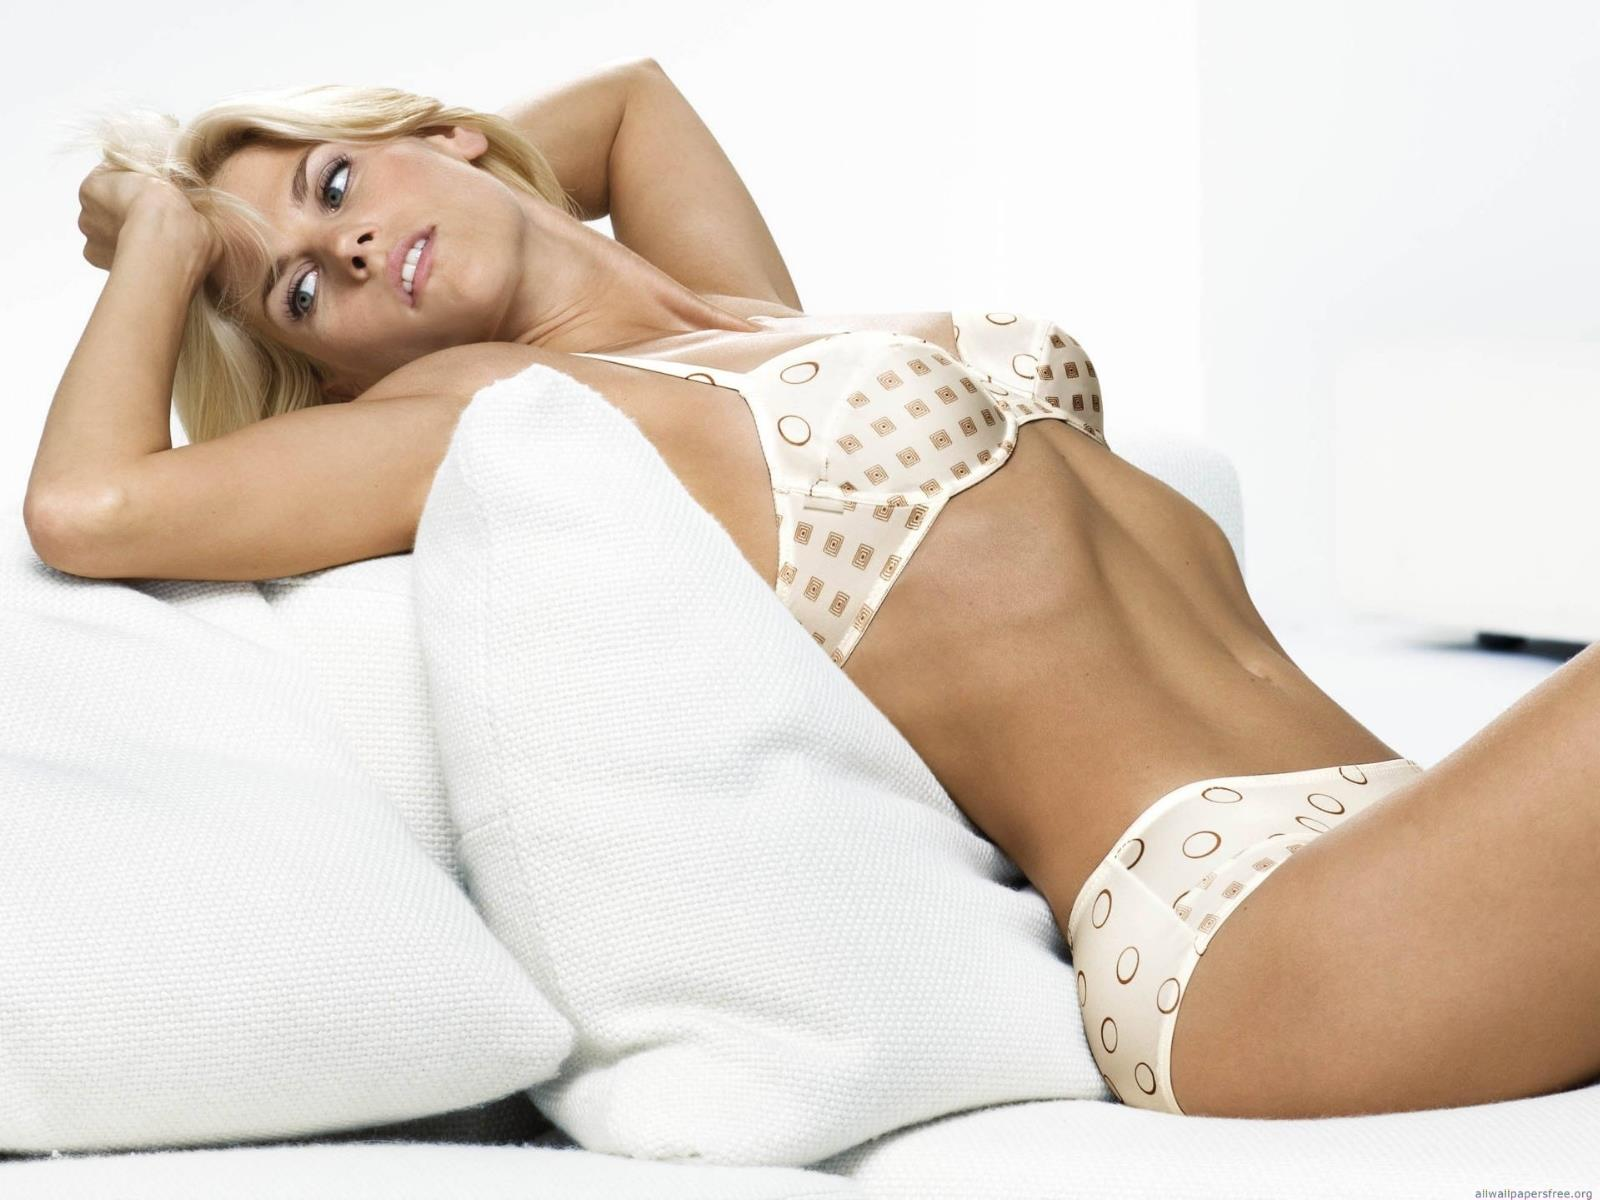 fonds-ecran-sexy_girls-hot-and-sexy_04